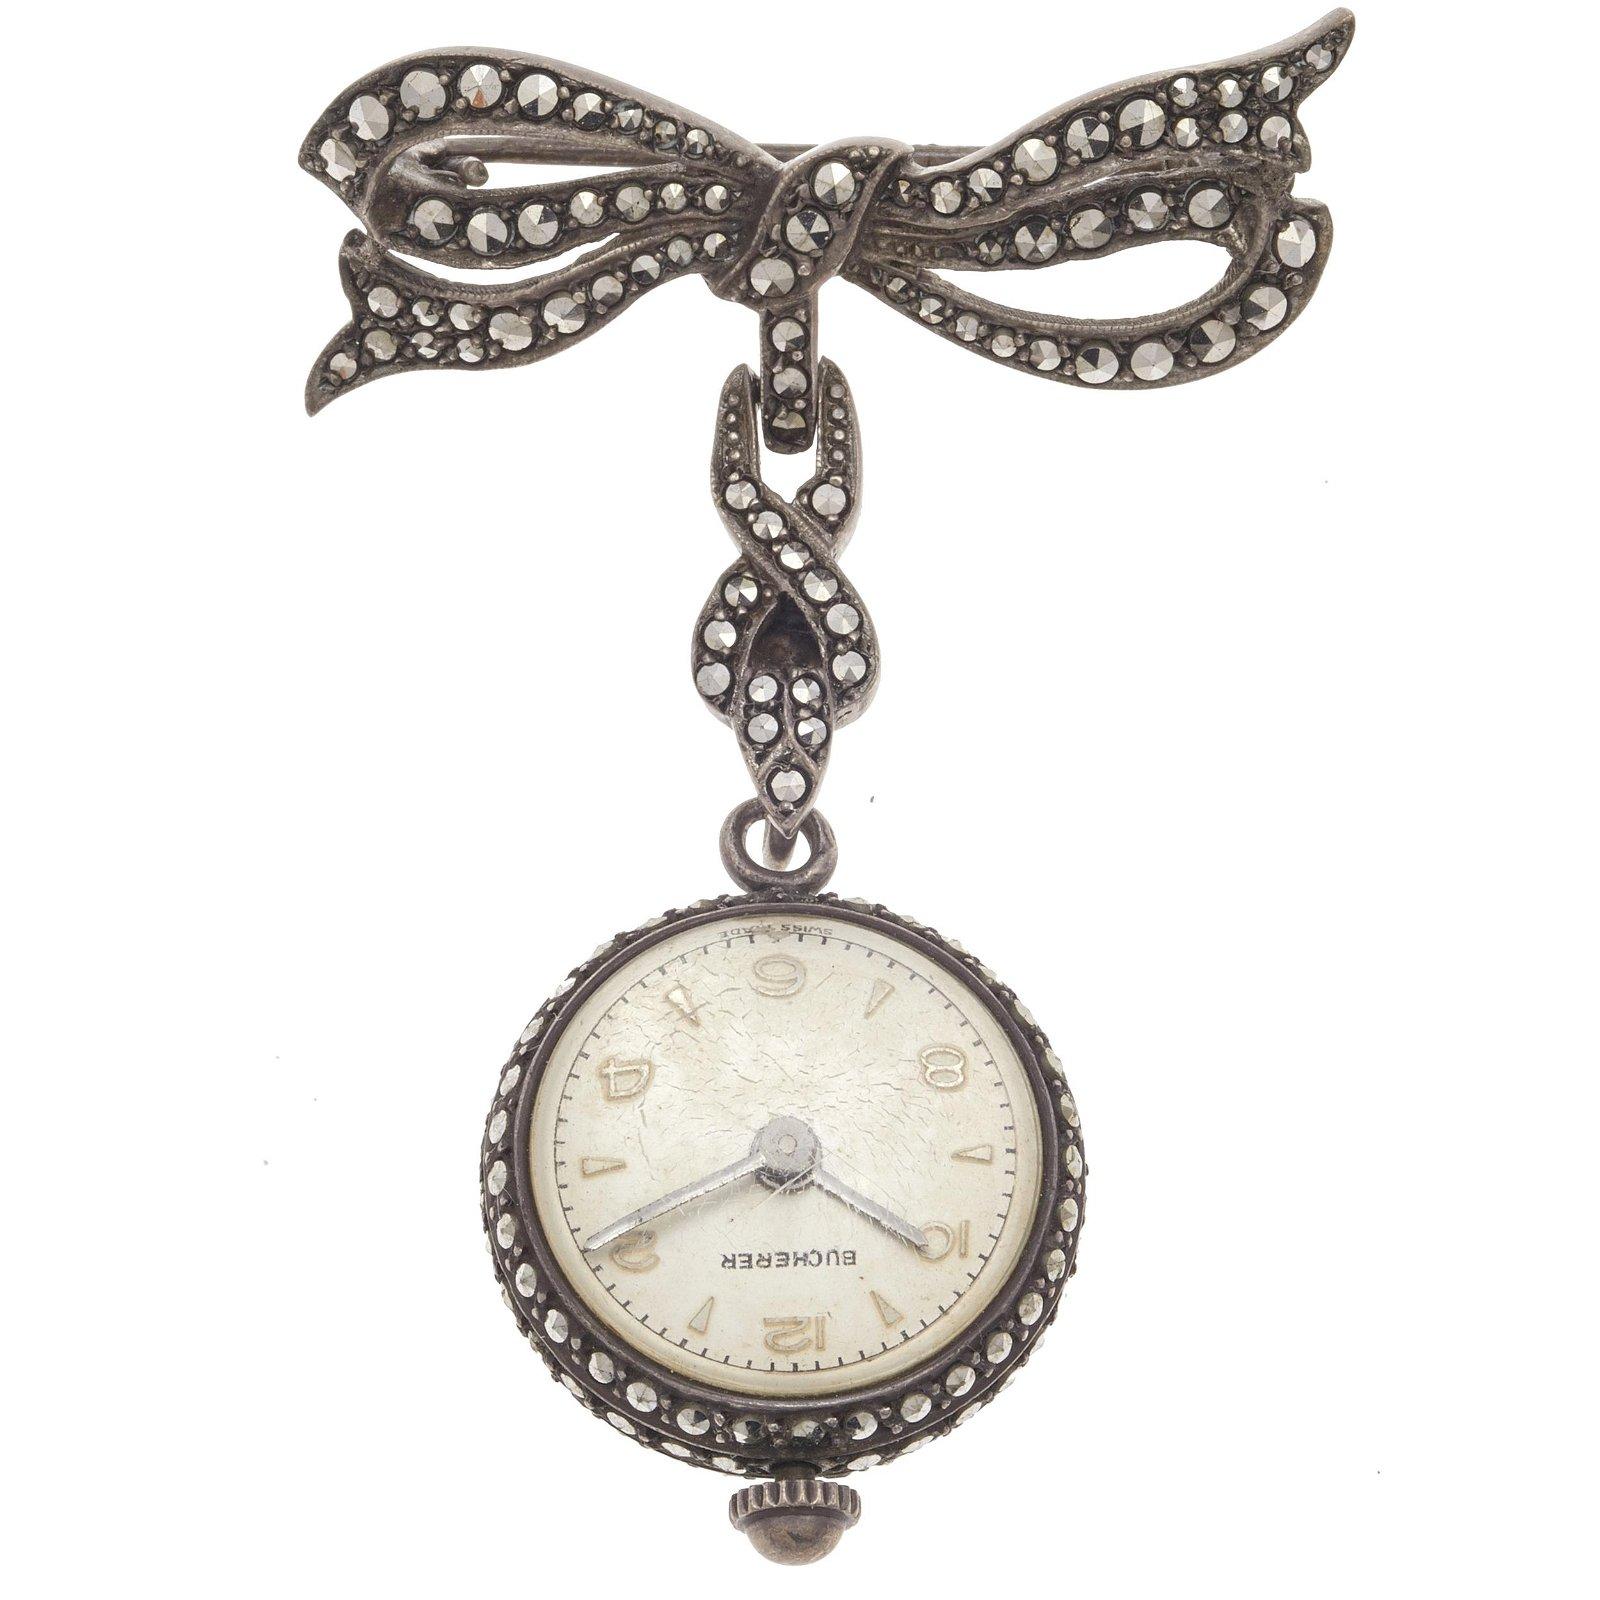 Bucherer Marcasite, Silver Pendant Watch on Pin